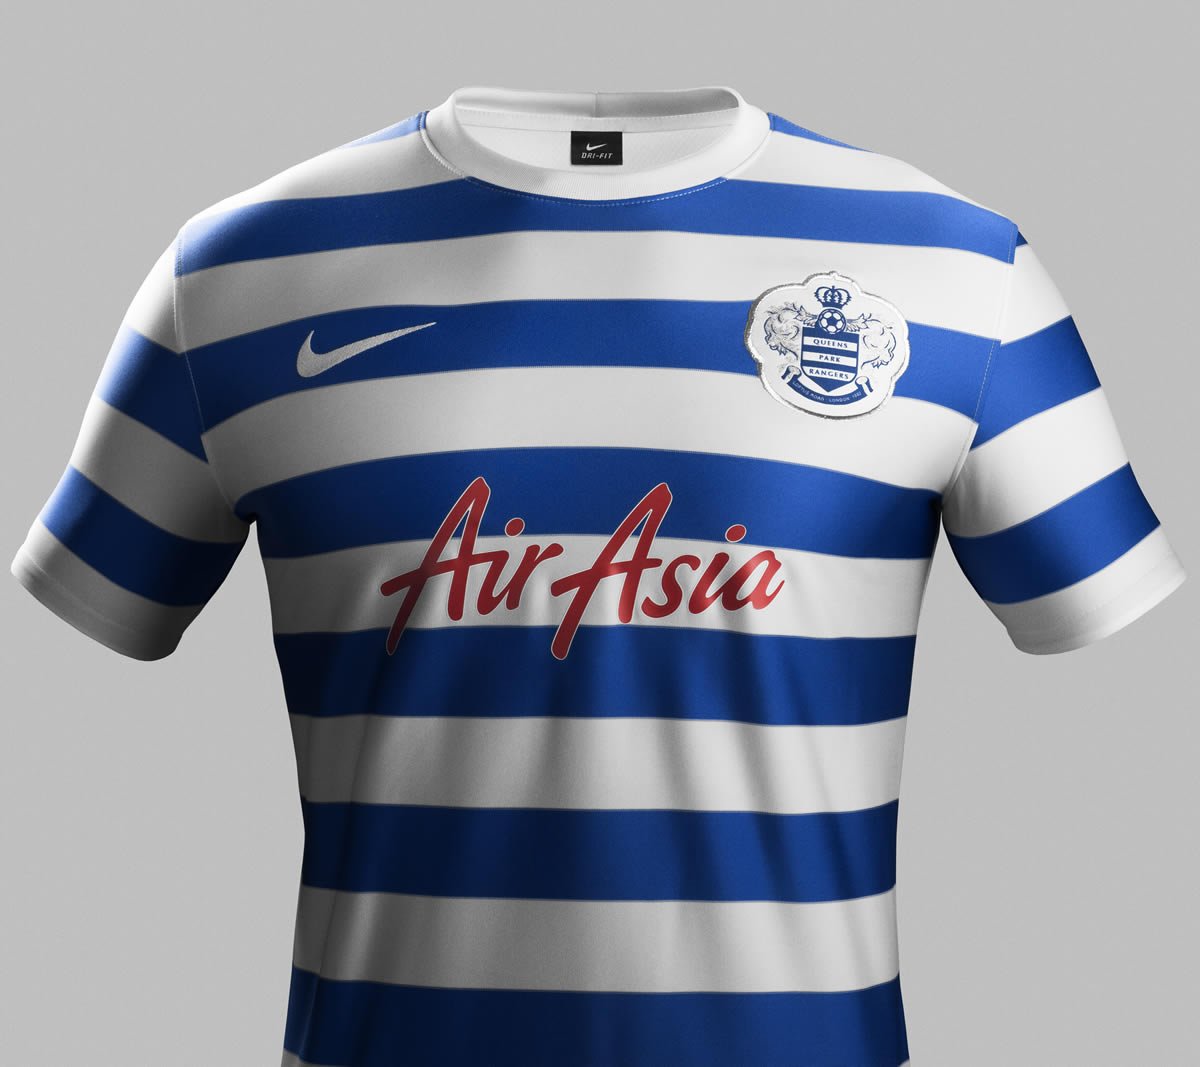 Camiseta titular QPR | Foto Nike